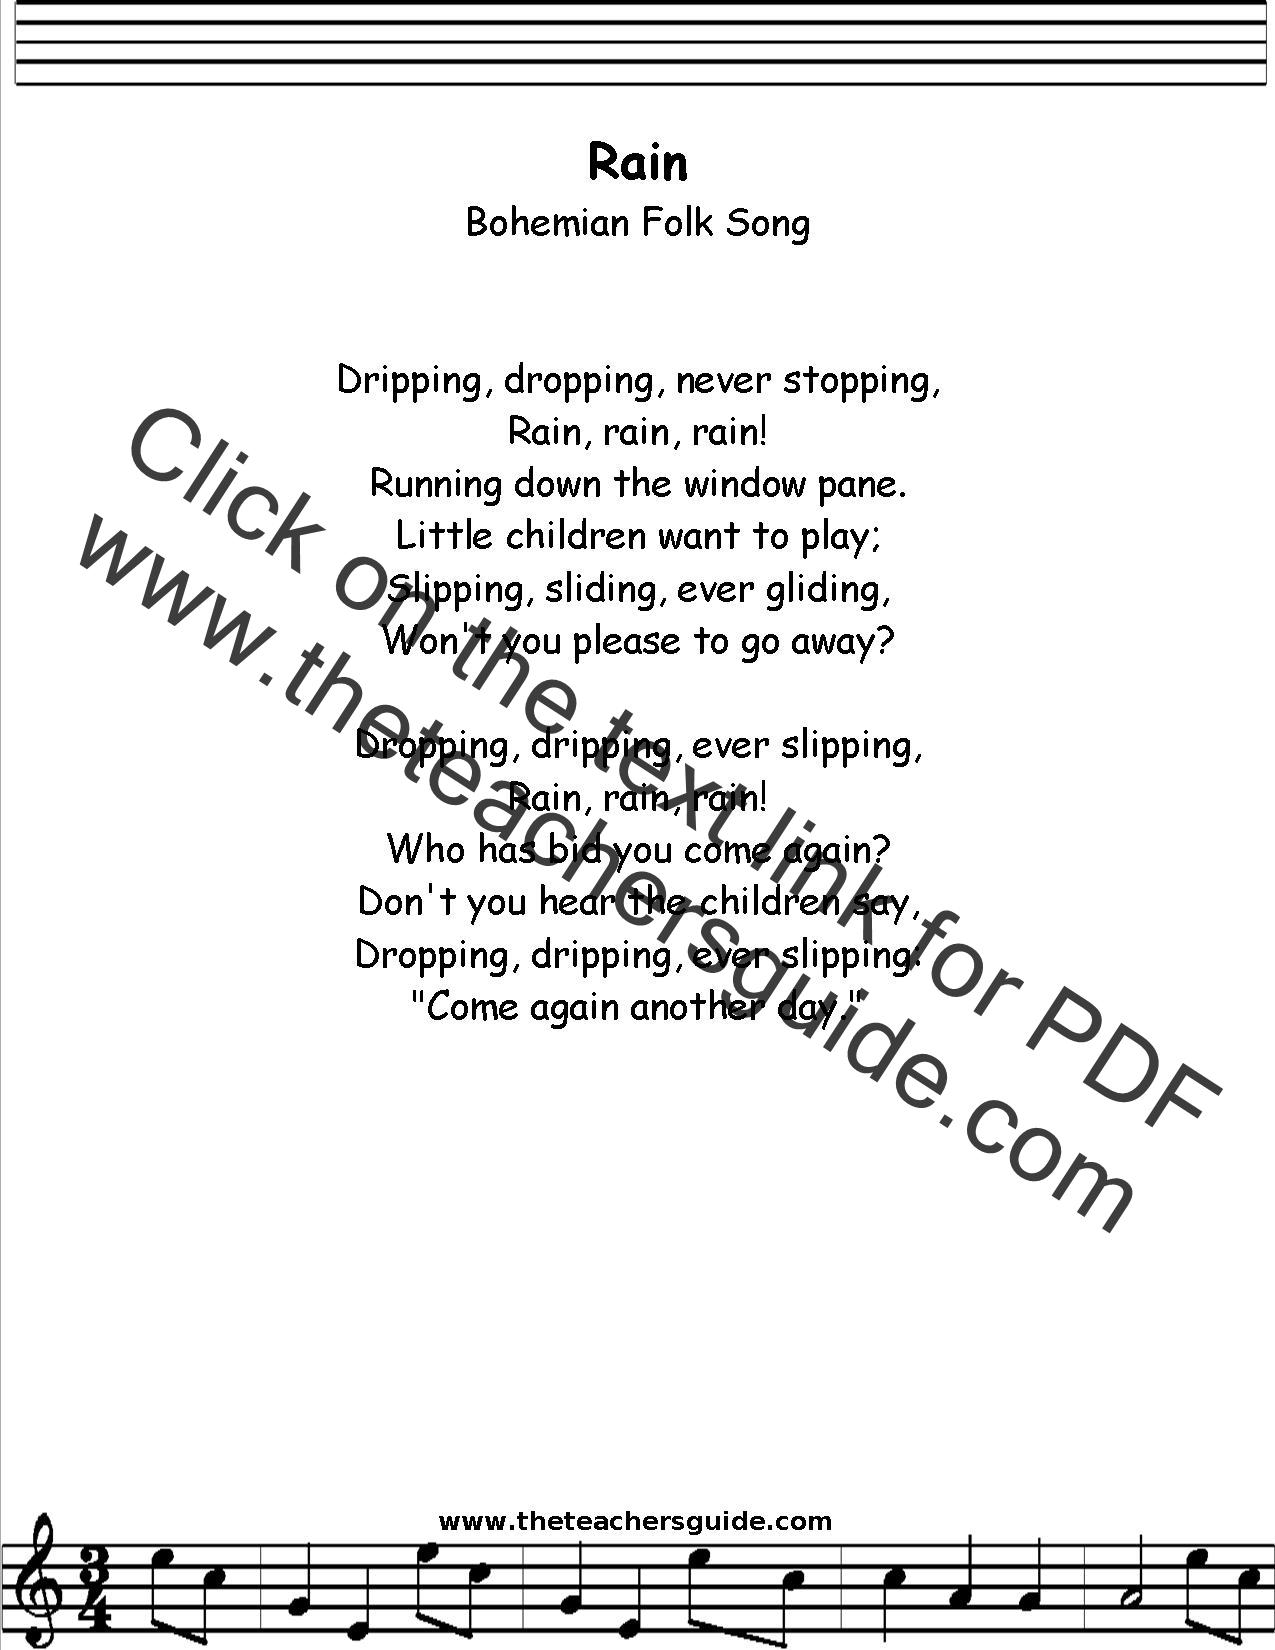 Rain Bohemian Folk Song Lyrics Printout Midi And Video